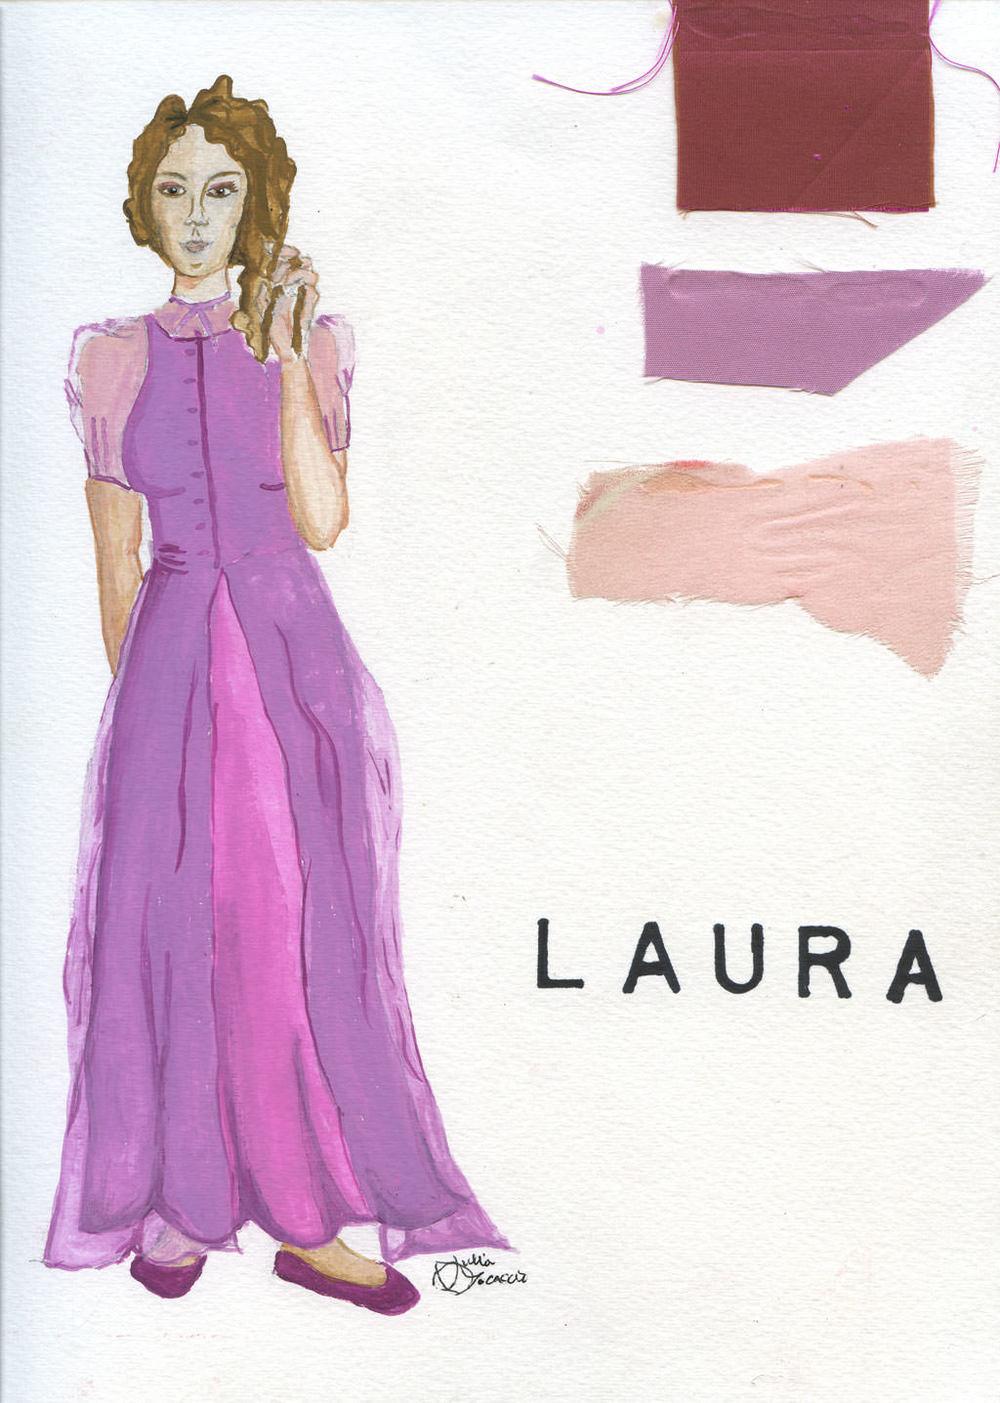 Laura copy.jpg